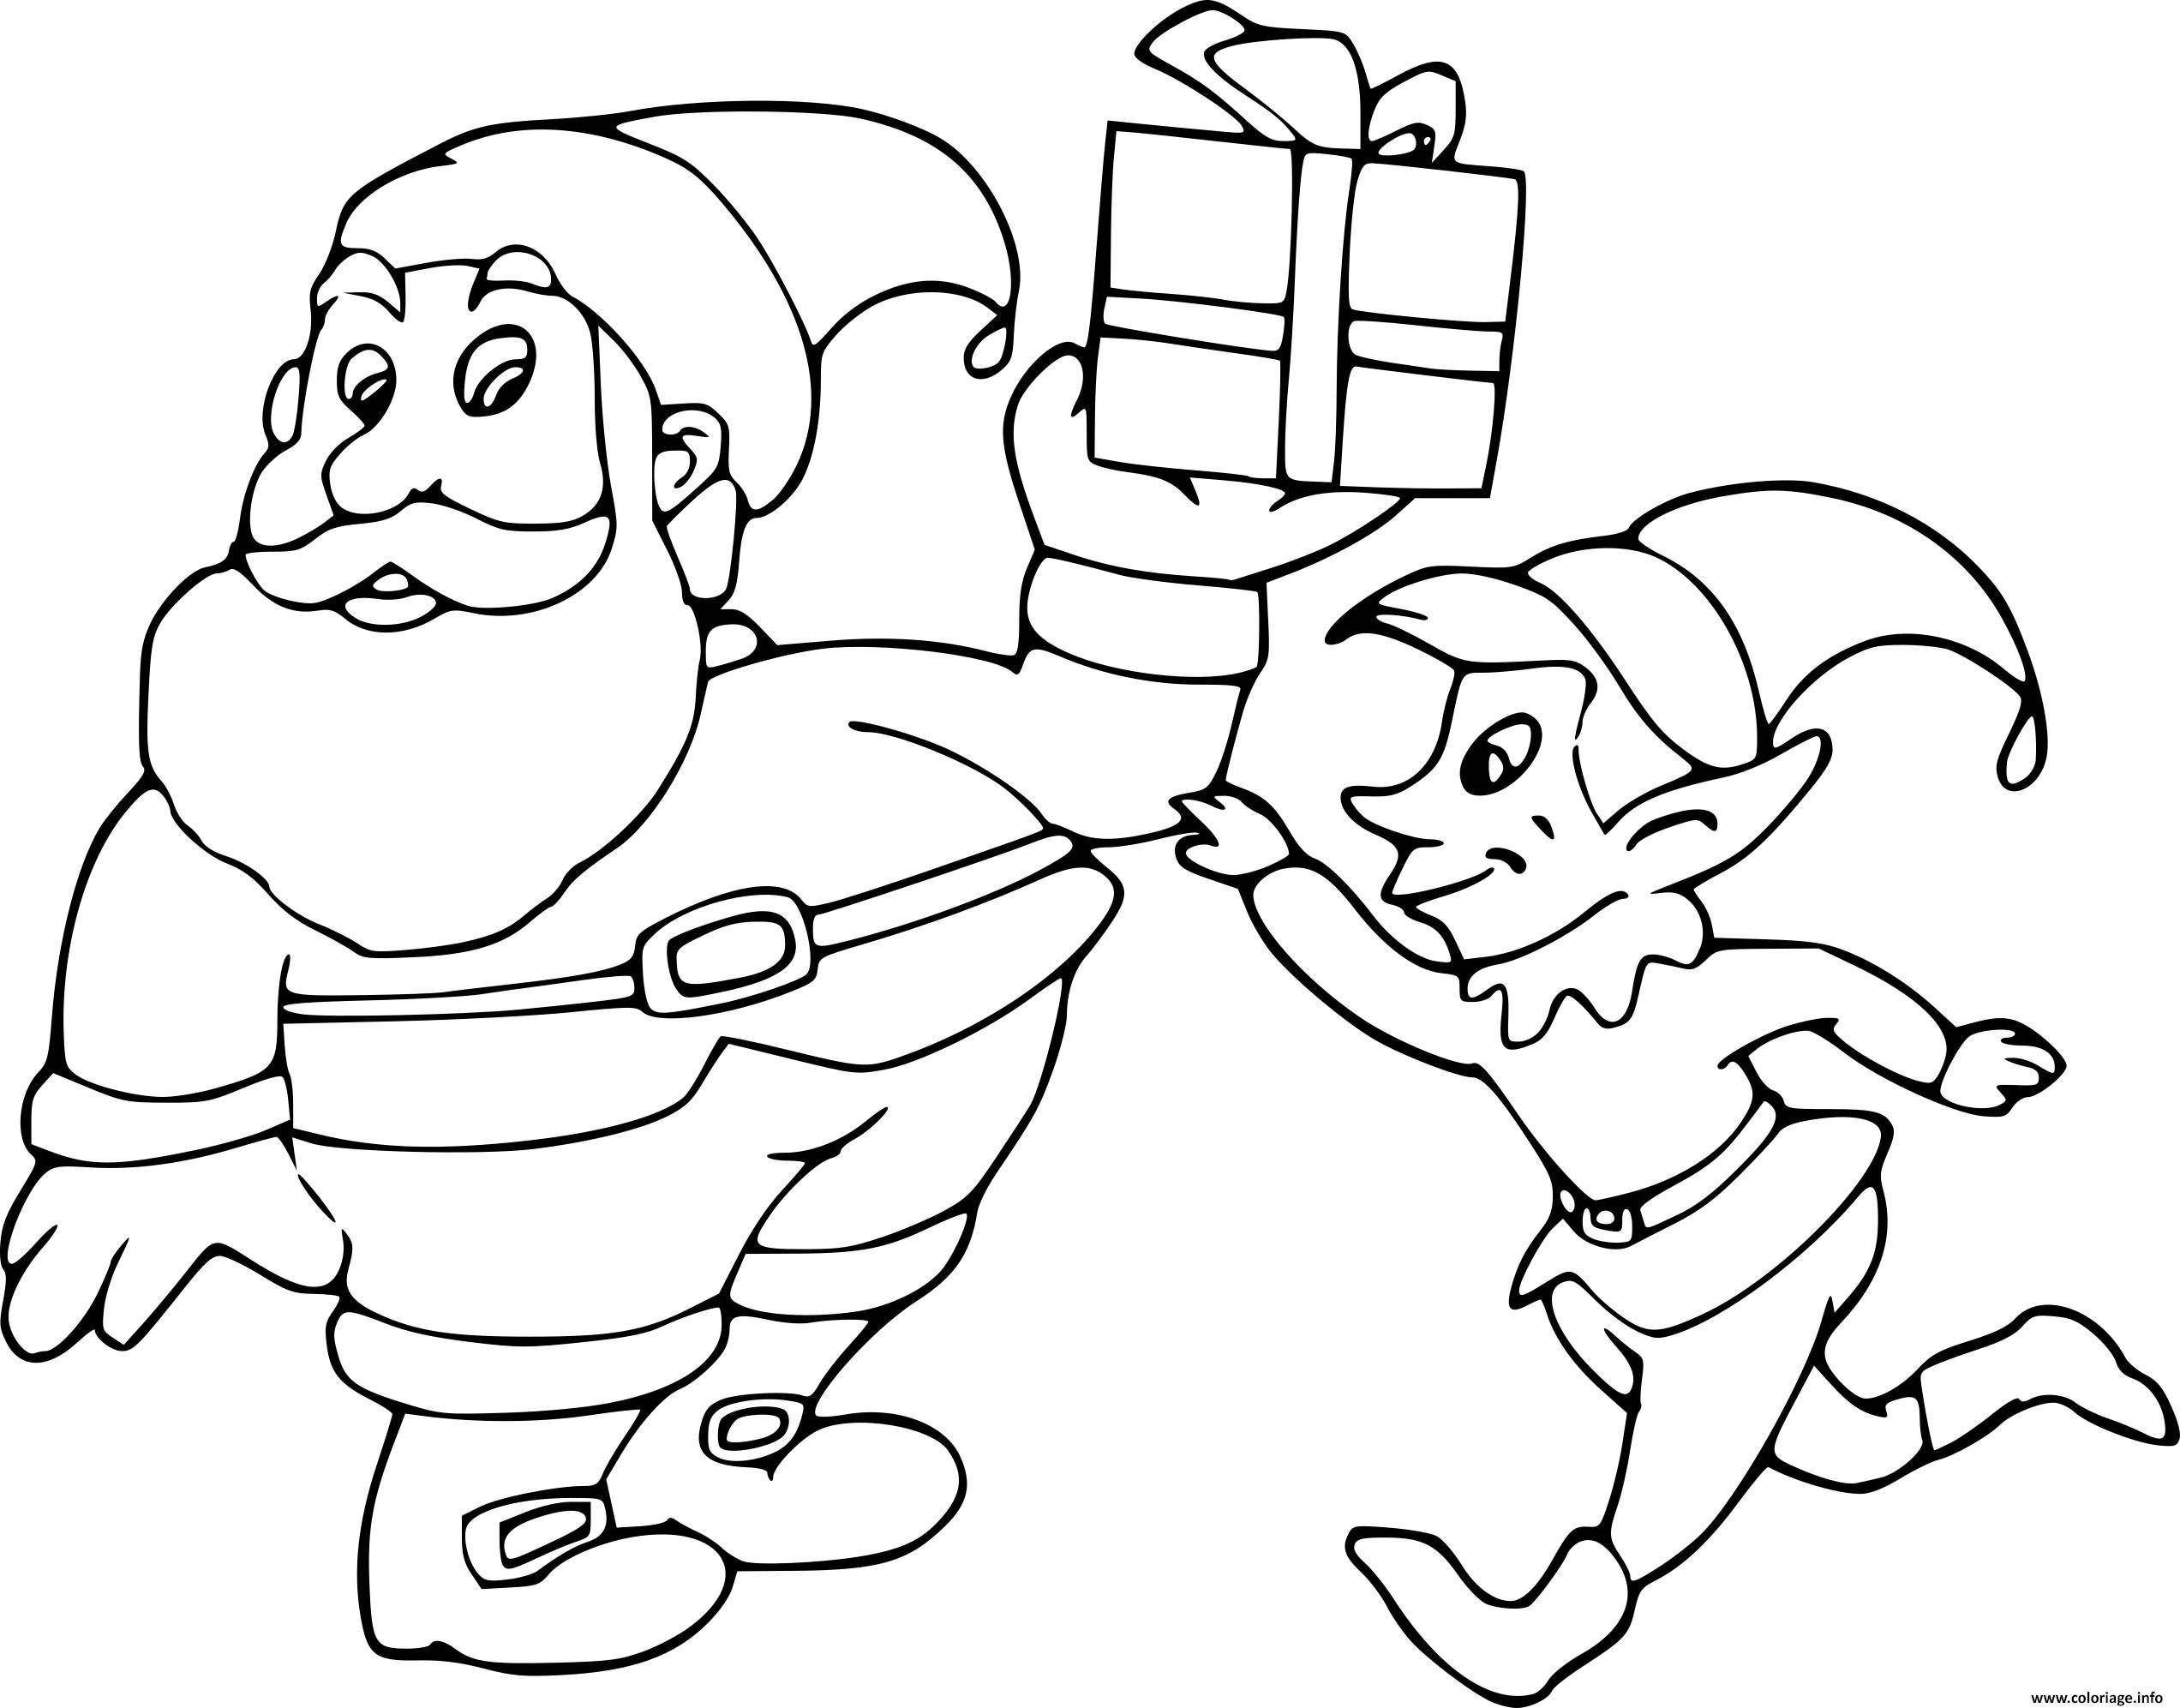 Coloriage Le Pere Noel Et Le Lutin dessin